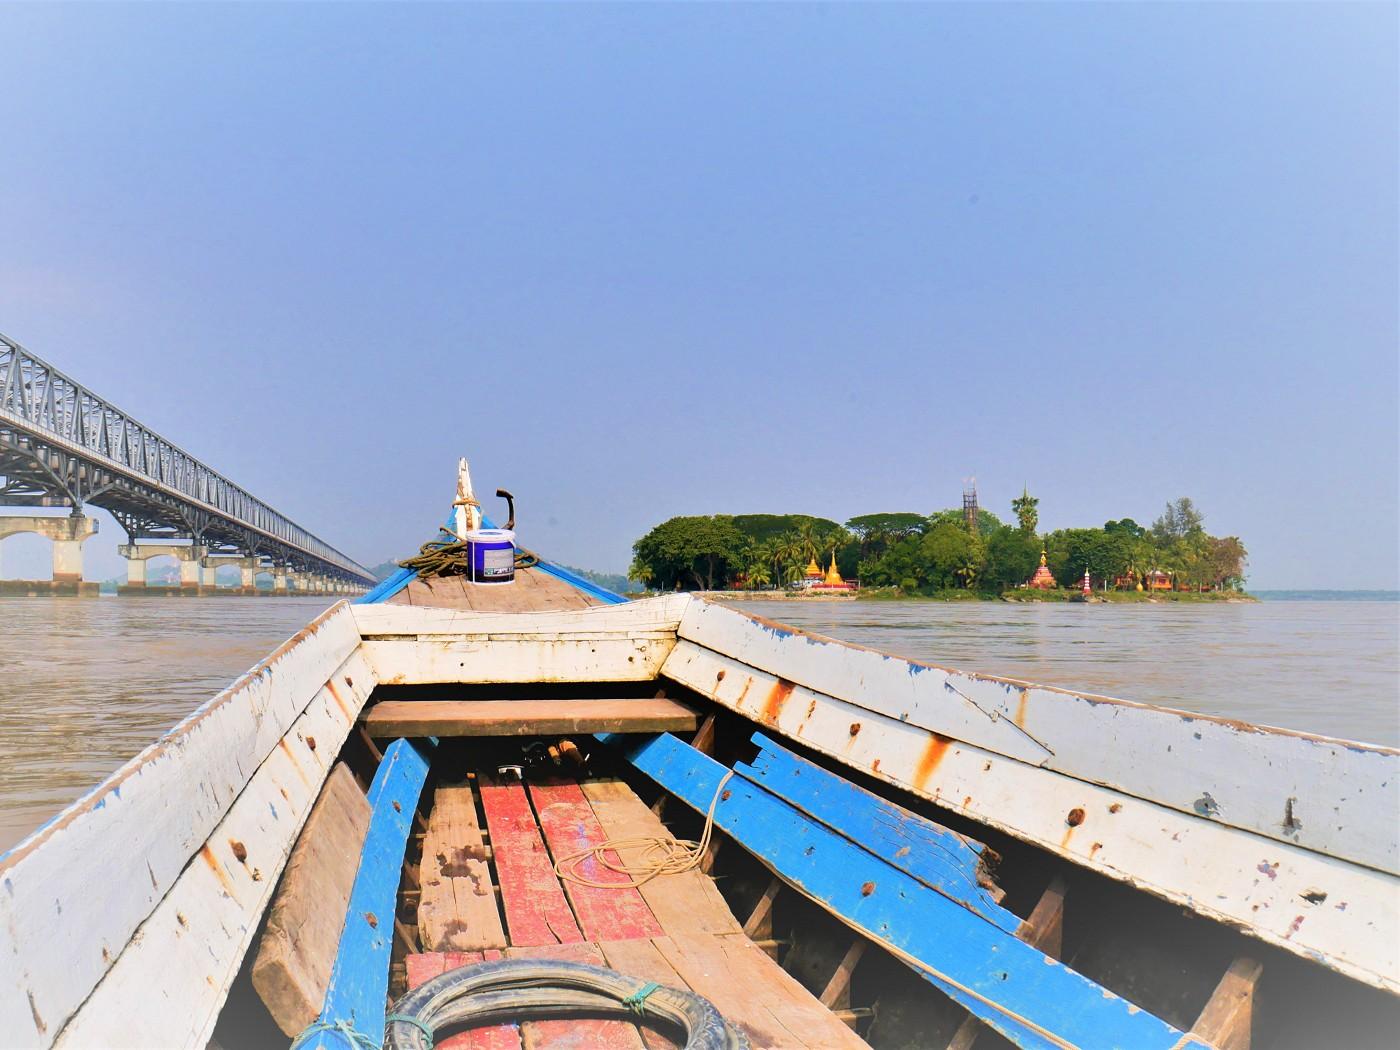 Ferry ride jetty Gaung Say Kyun Shampoo Island Mawlamyine Myanmar